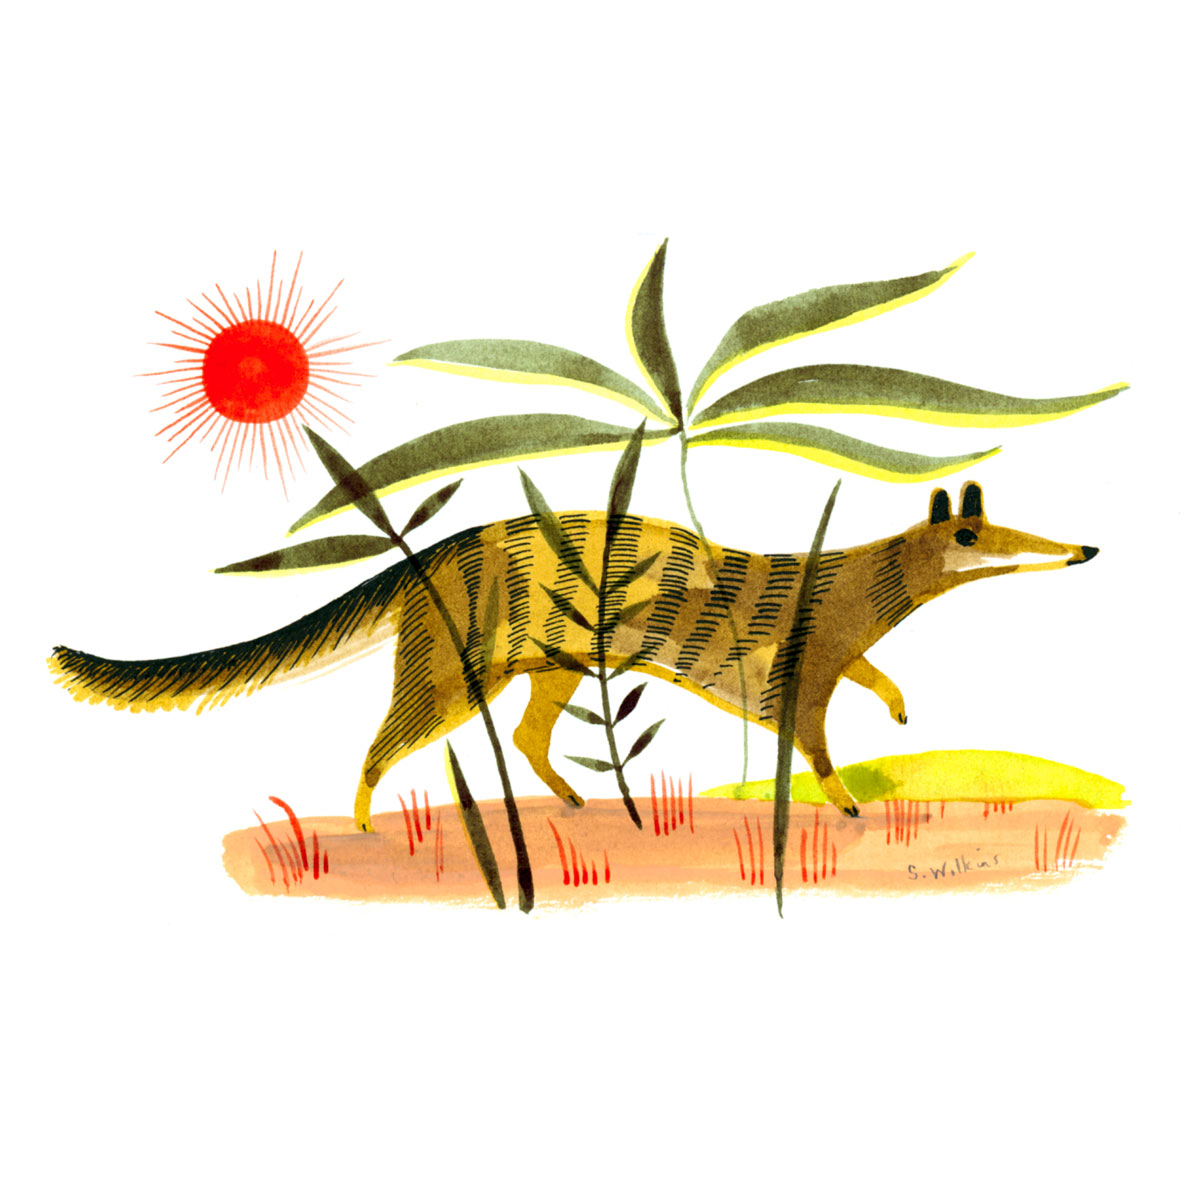 sarah_wilkins_illustration_cute_little_animal